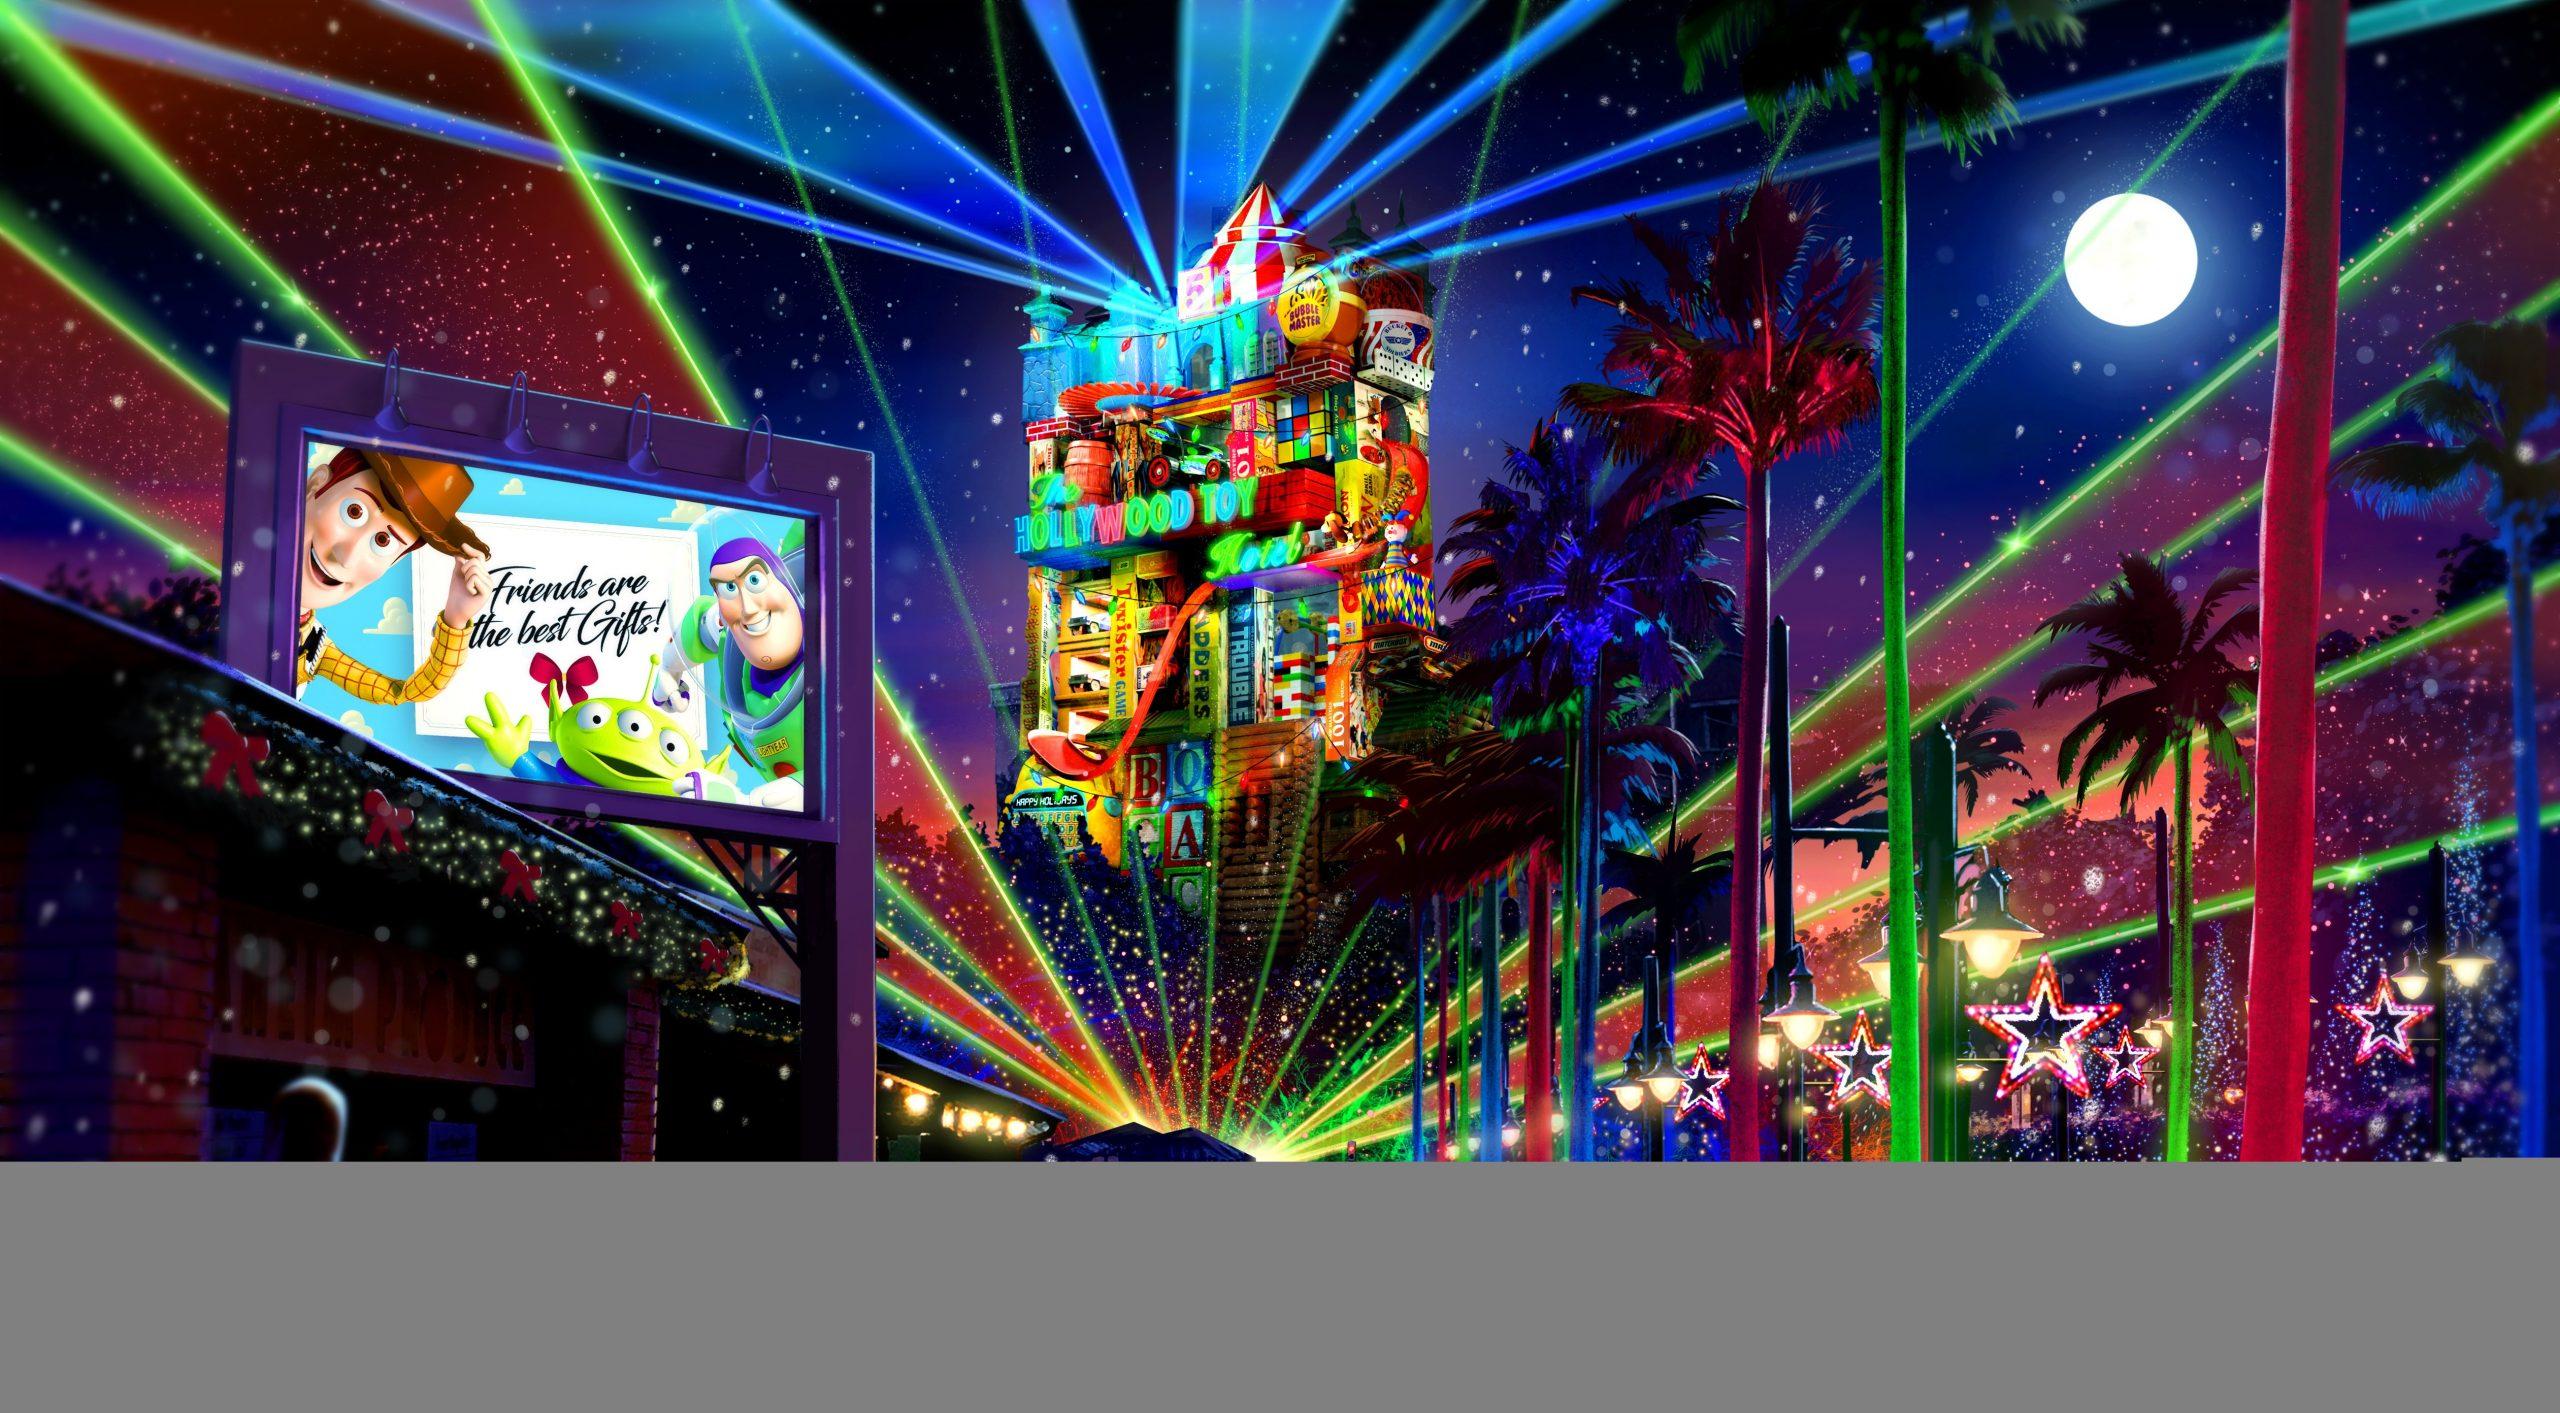 Experience Joy Throughout the Walt Disney World Resort this Holiday Season